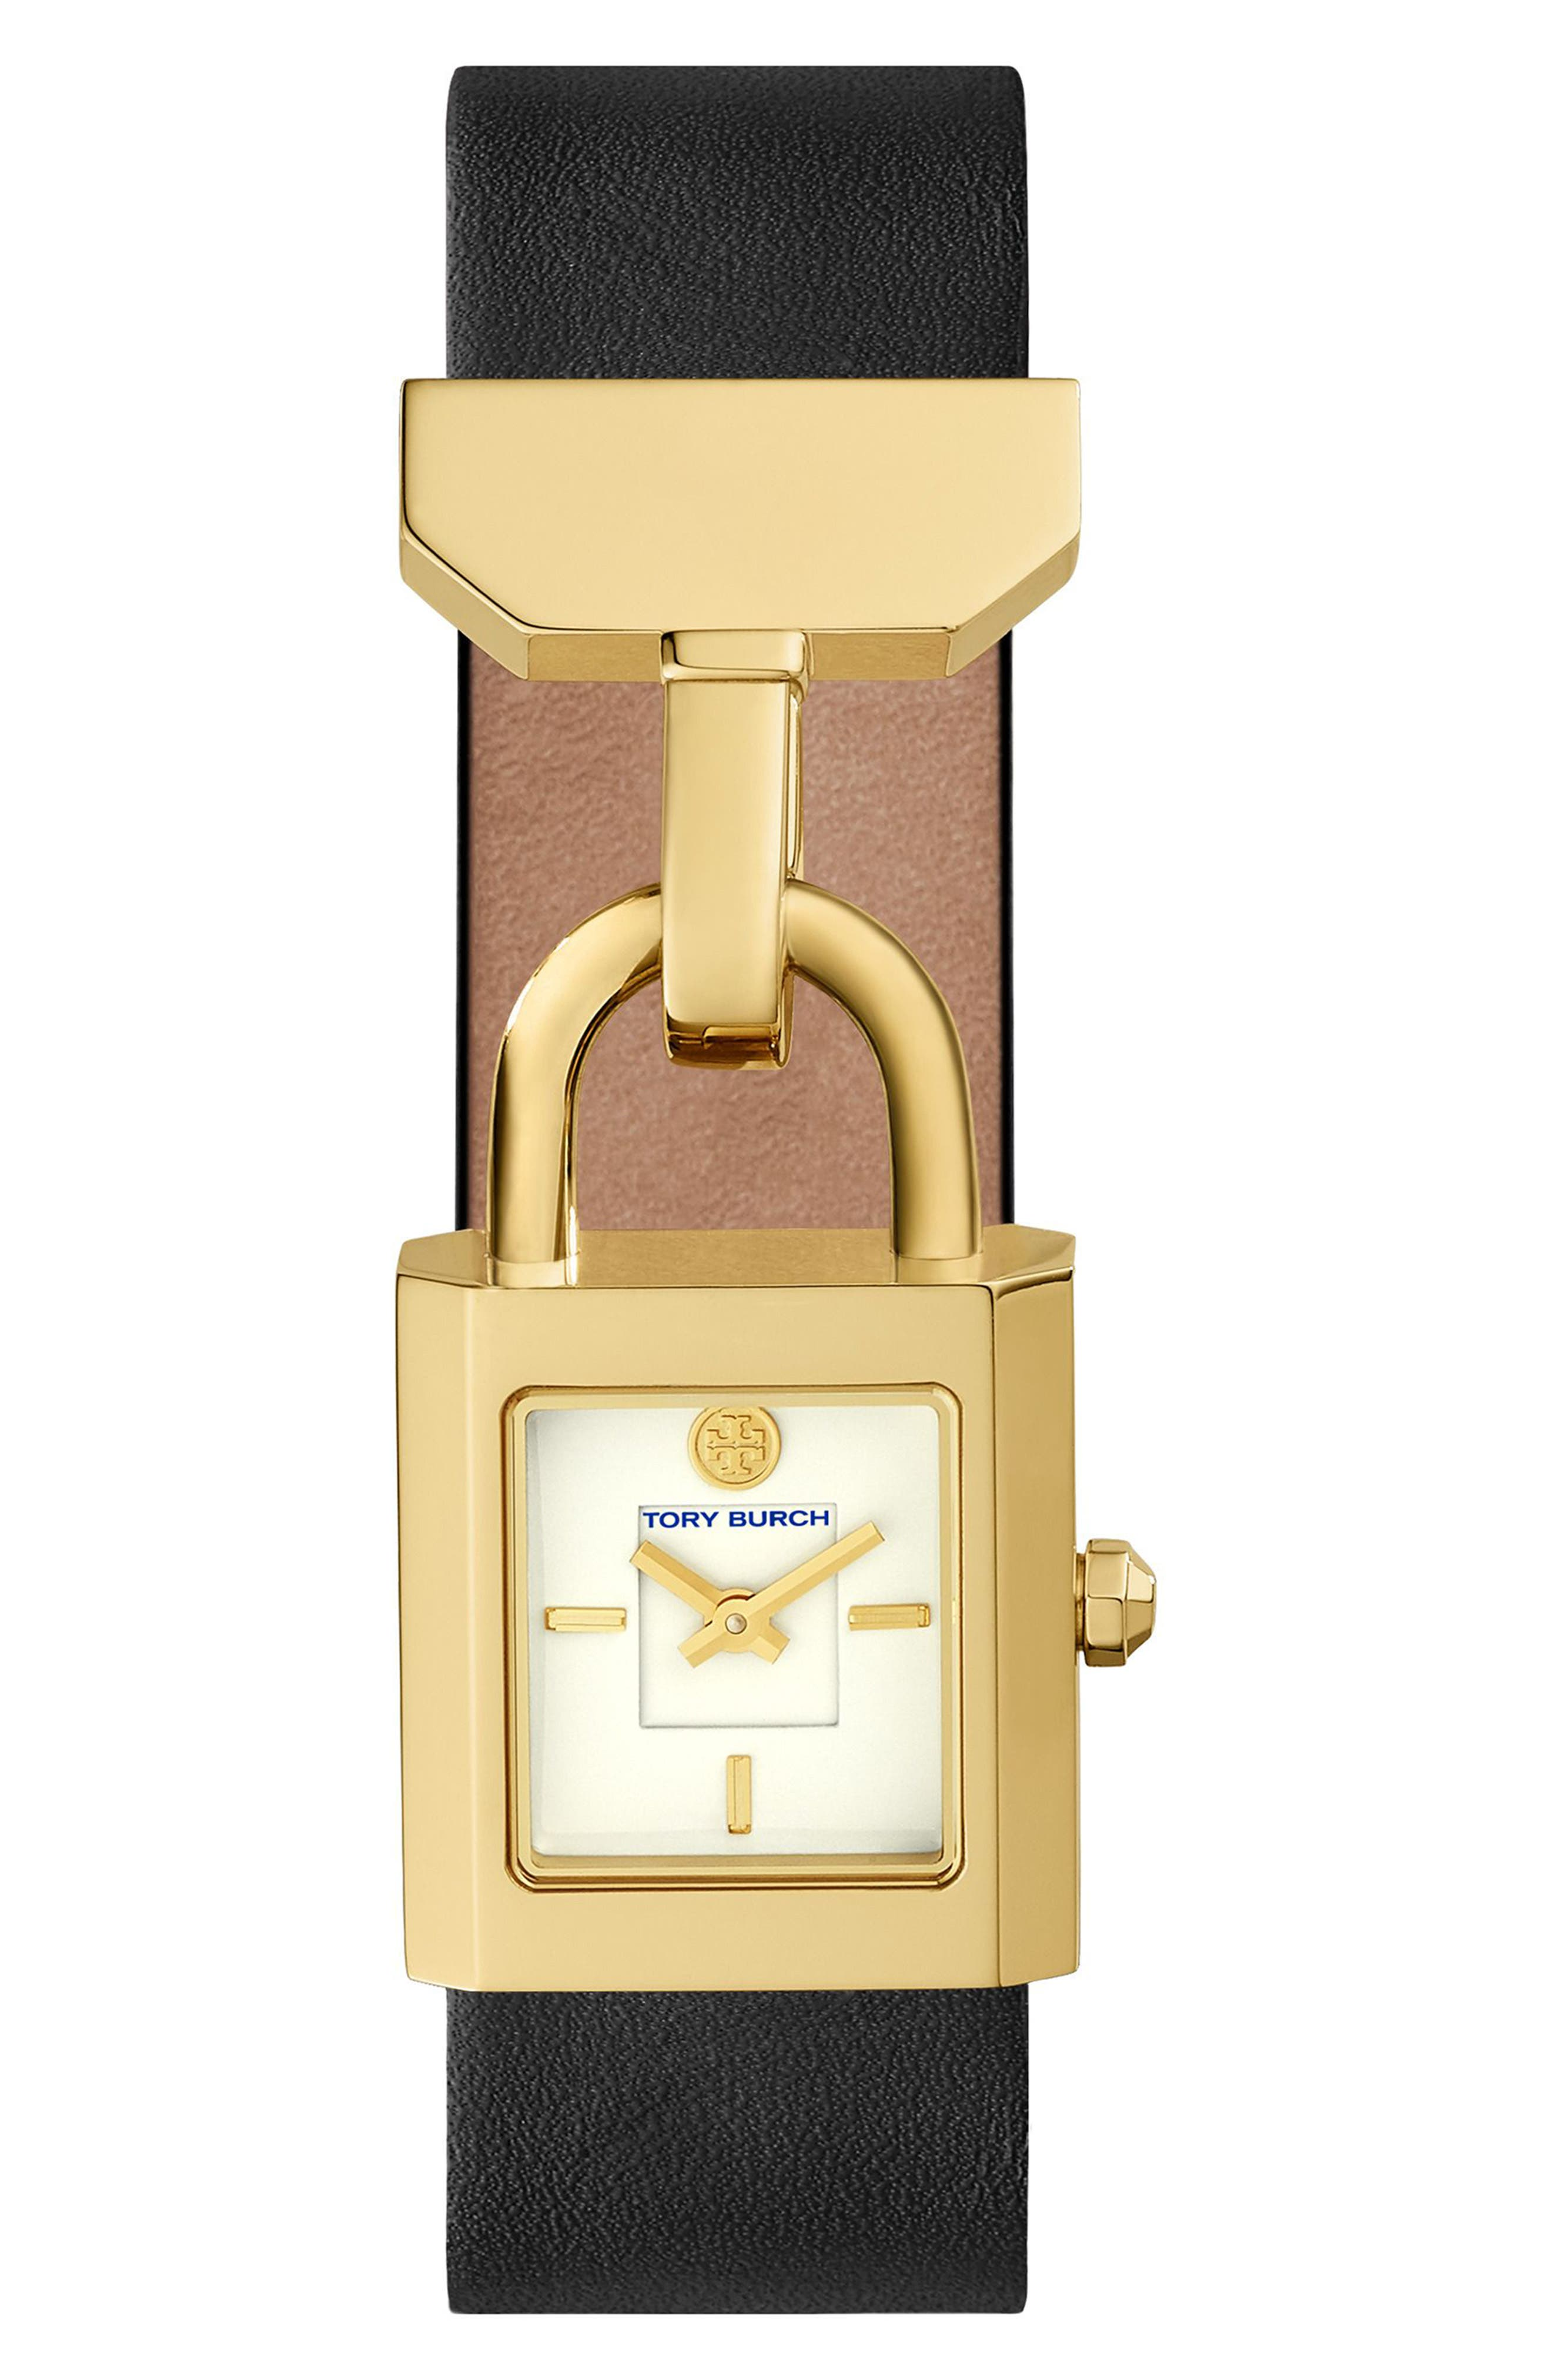 Tory Burch Surrey Leather Strap Watch, 22mm x 23.5mm